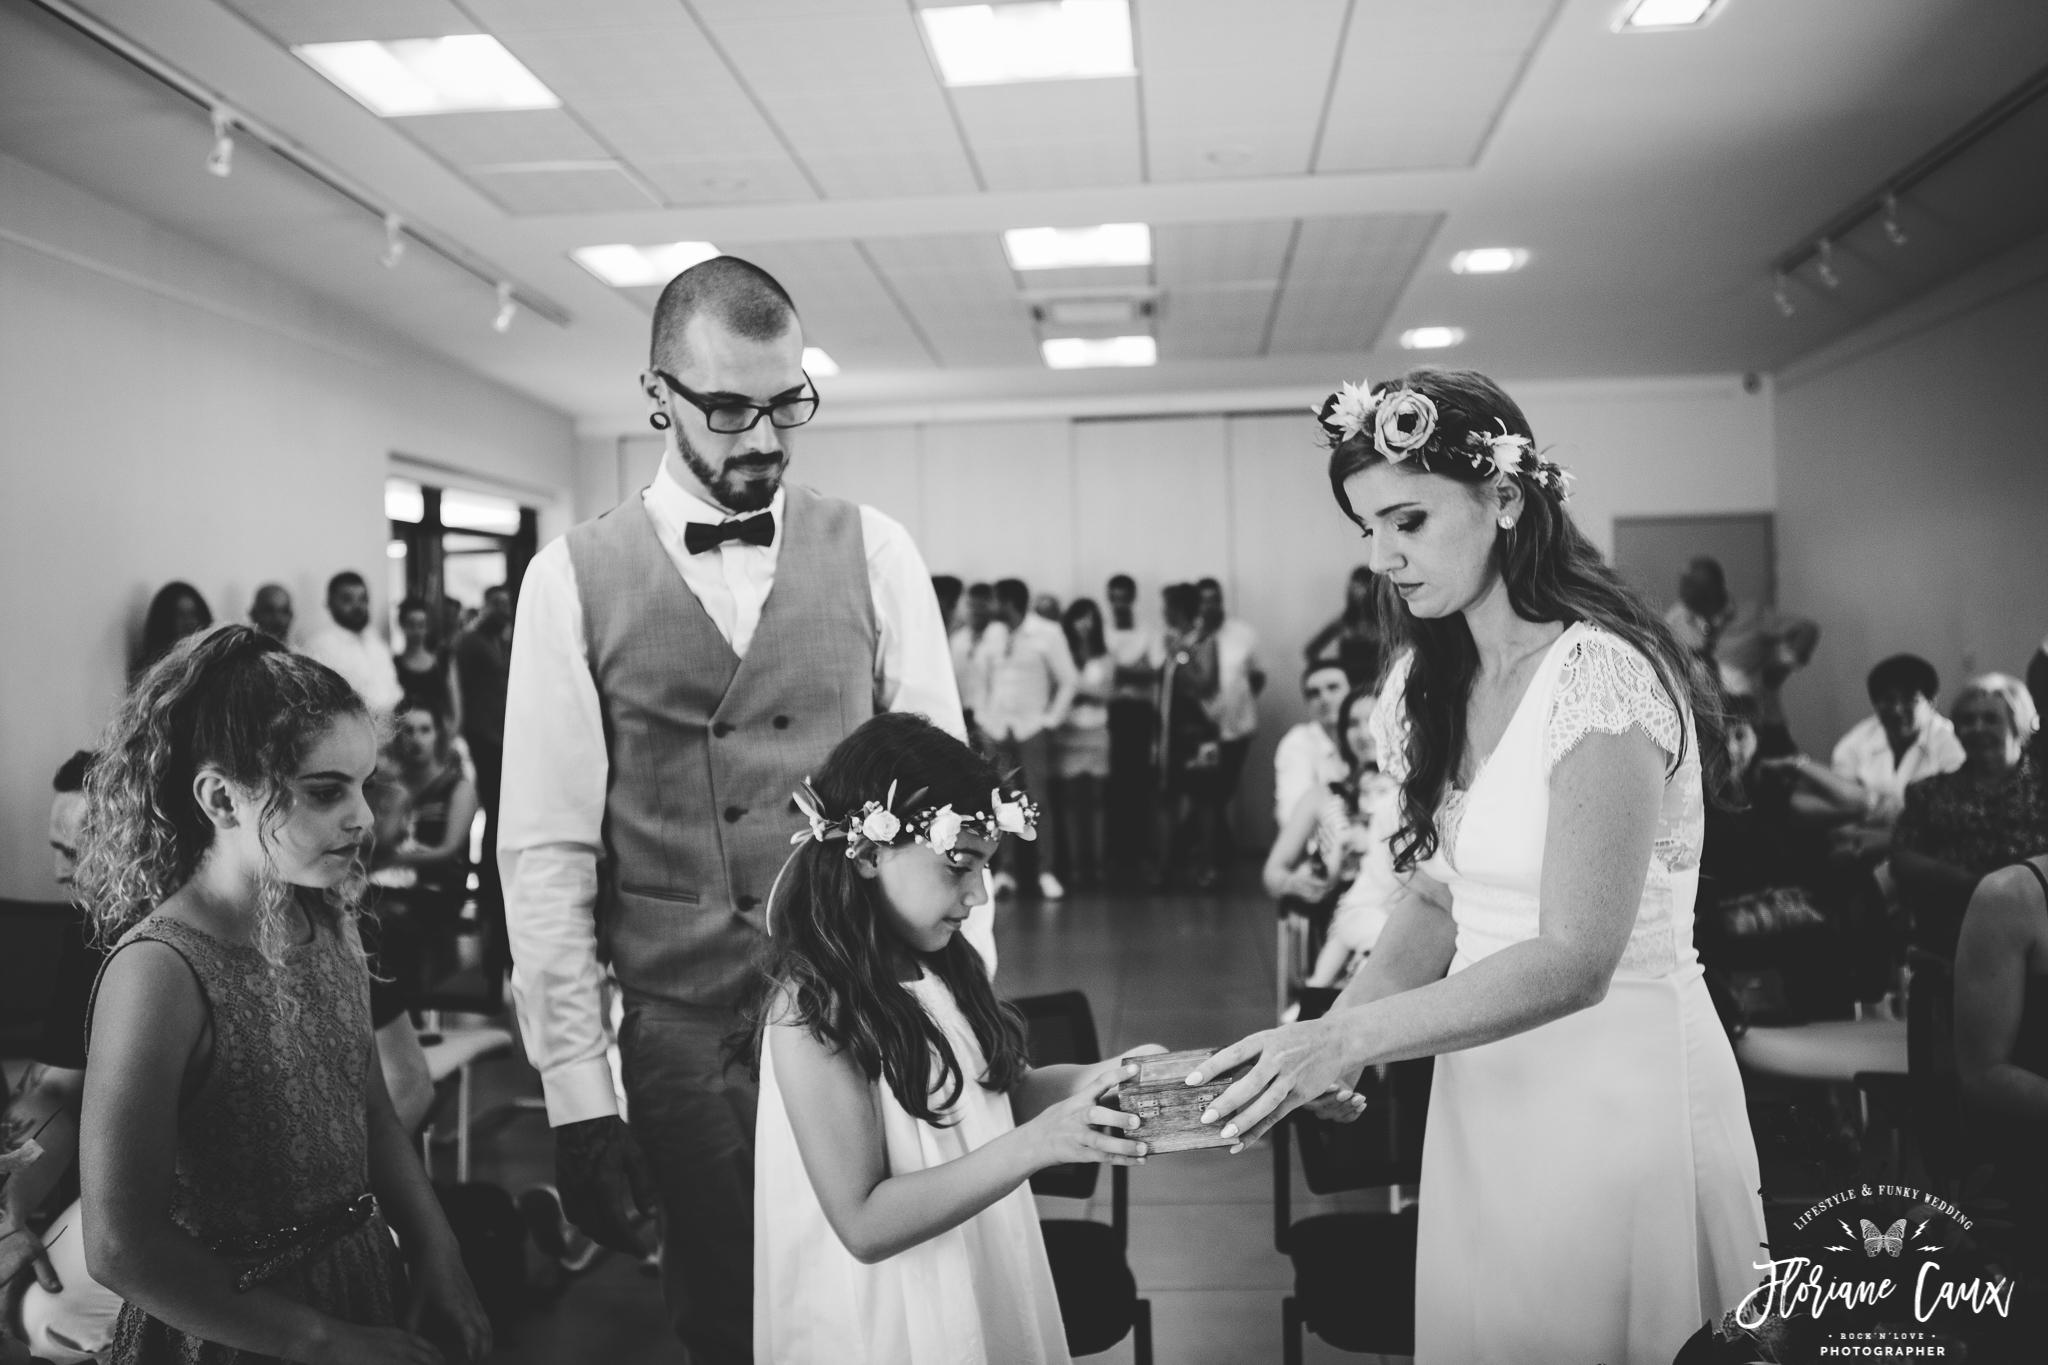 photographe-mariage-toulouse-rocknroll-maries-tatoues-floriane-caux-35